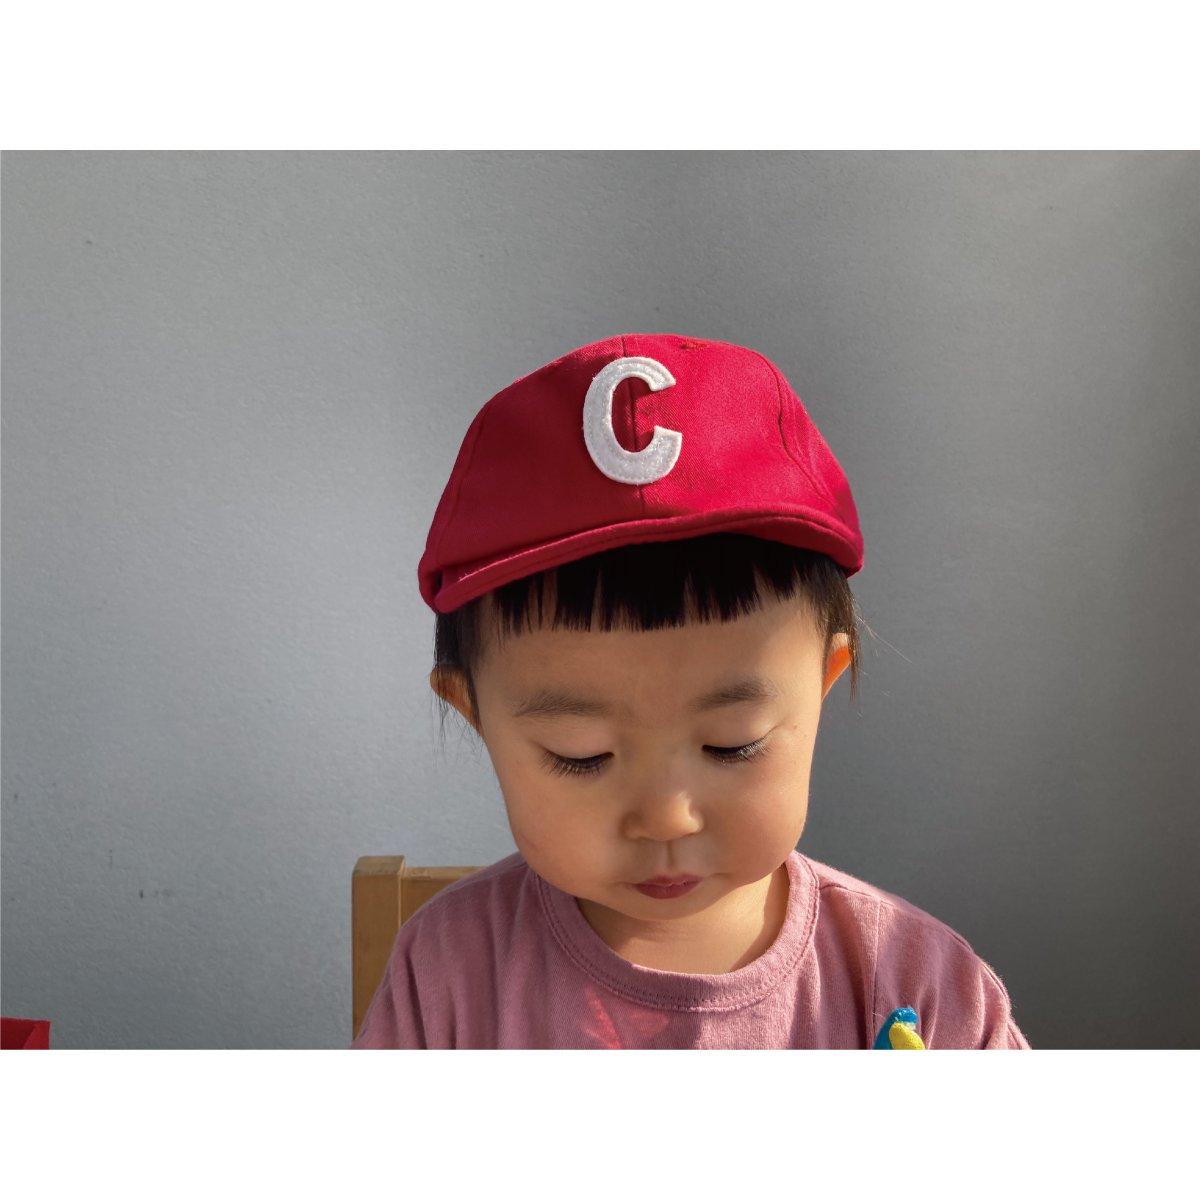 【KIDS】Kids Sim Logo Cap 詳細画像40